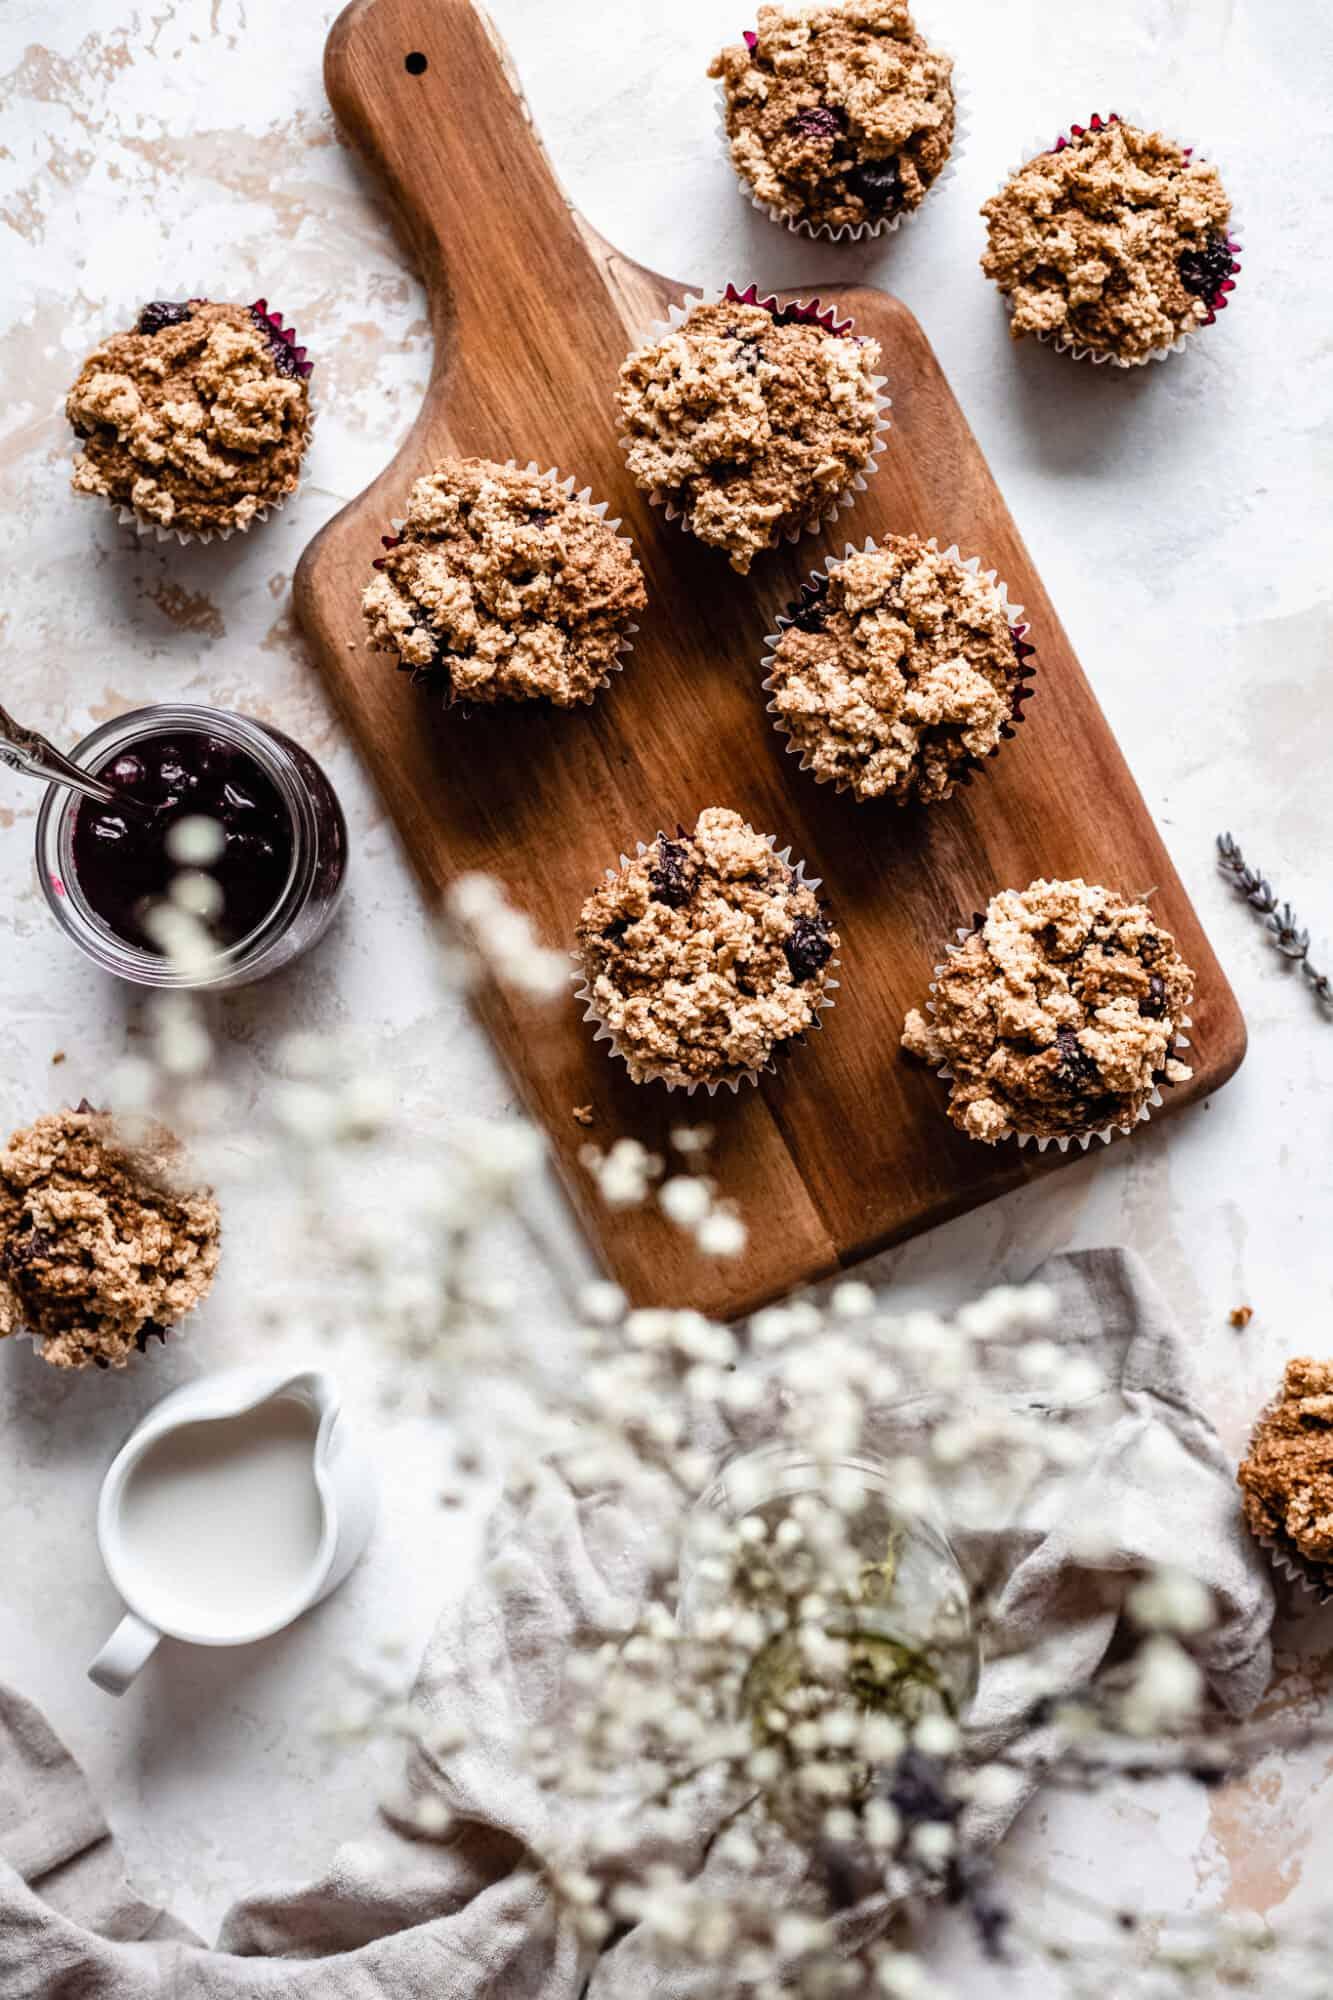 wooden board with gluten free vegan blueberry muffins